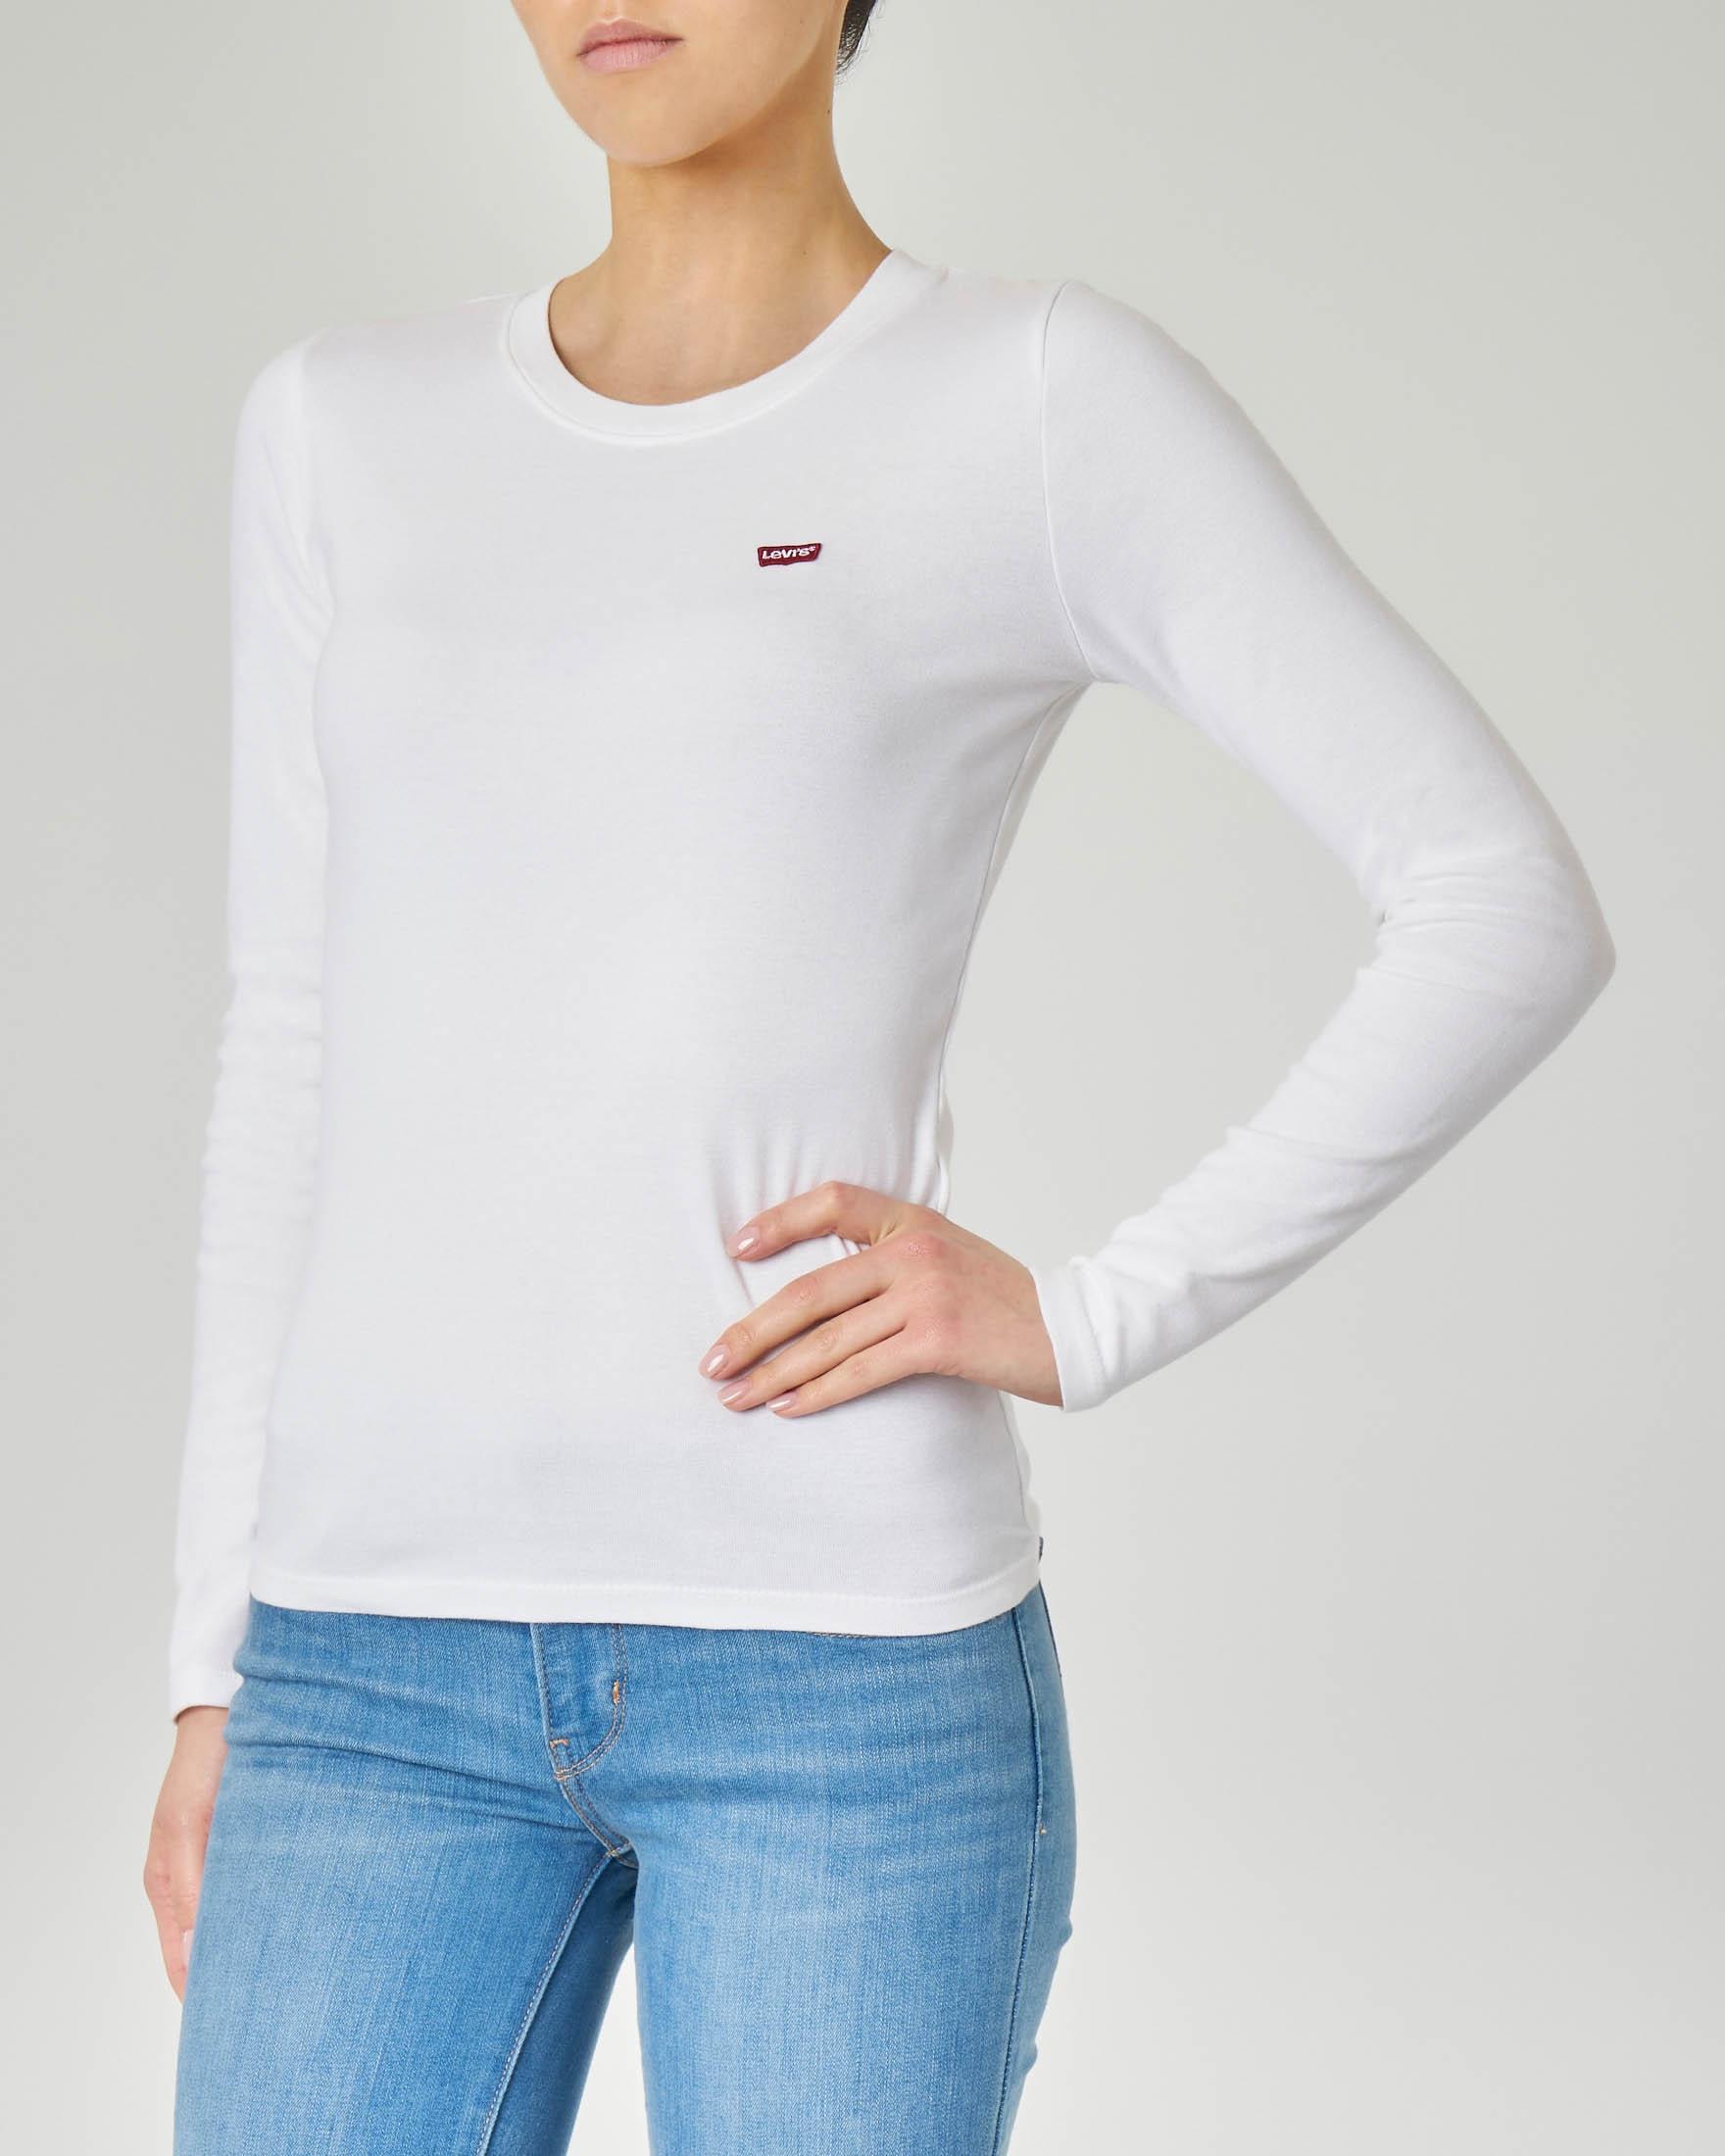 T-shirt bianca manica lunga con logo